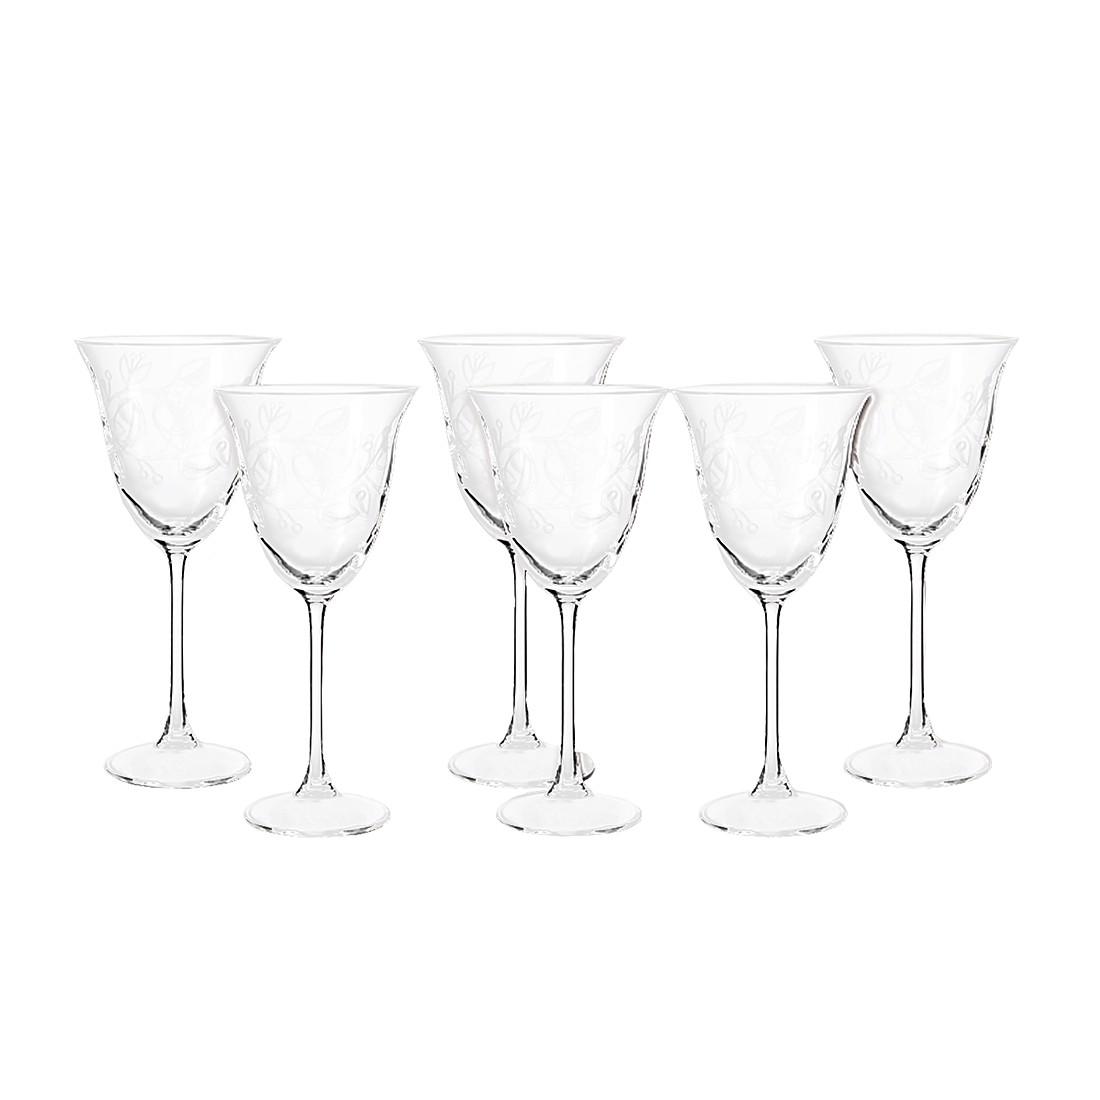 Weißweinglas Savini (6er-Set) – Klar, Leonardo online kaufen